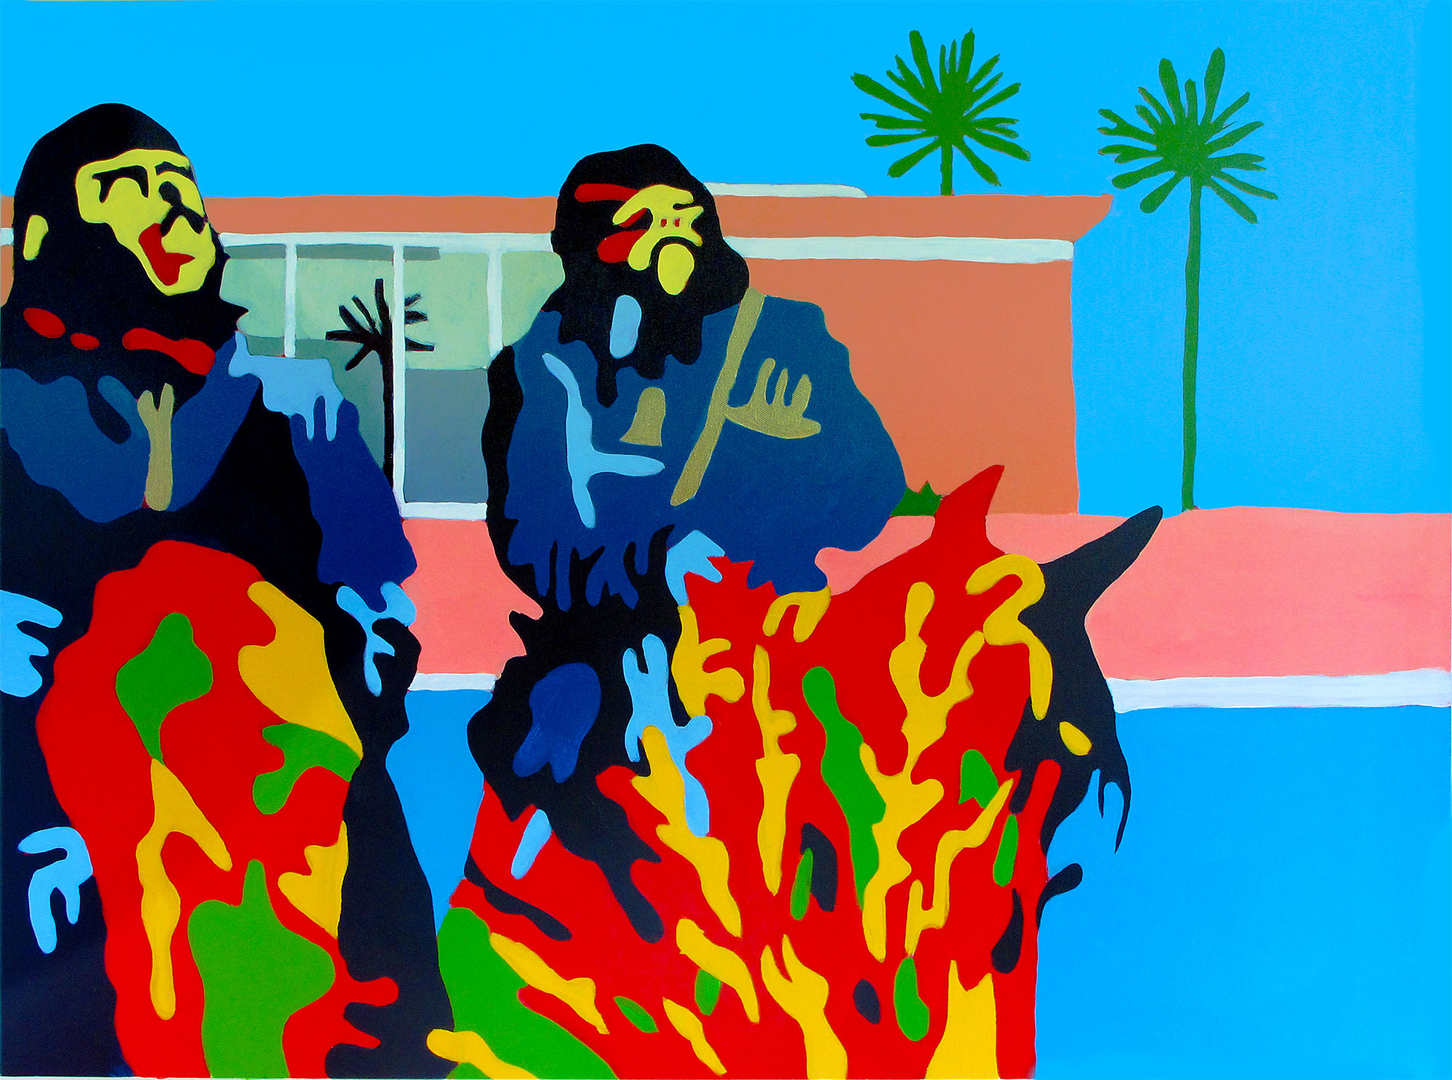 Gorillas At The Big Splash  30x40 inches Acrylic on canvas